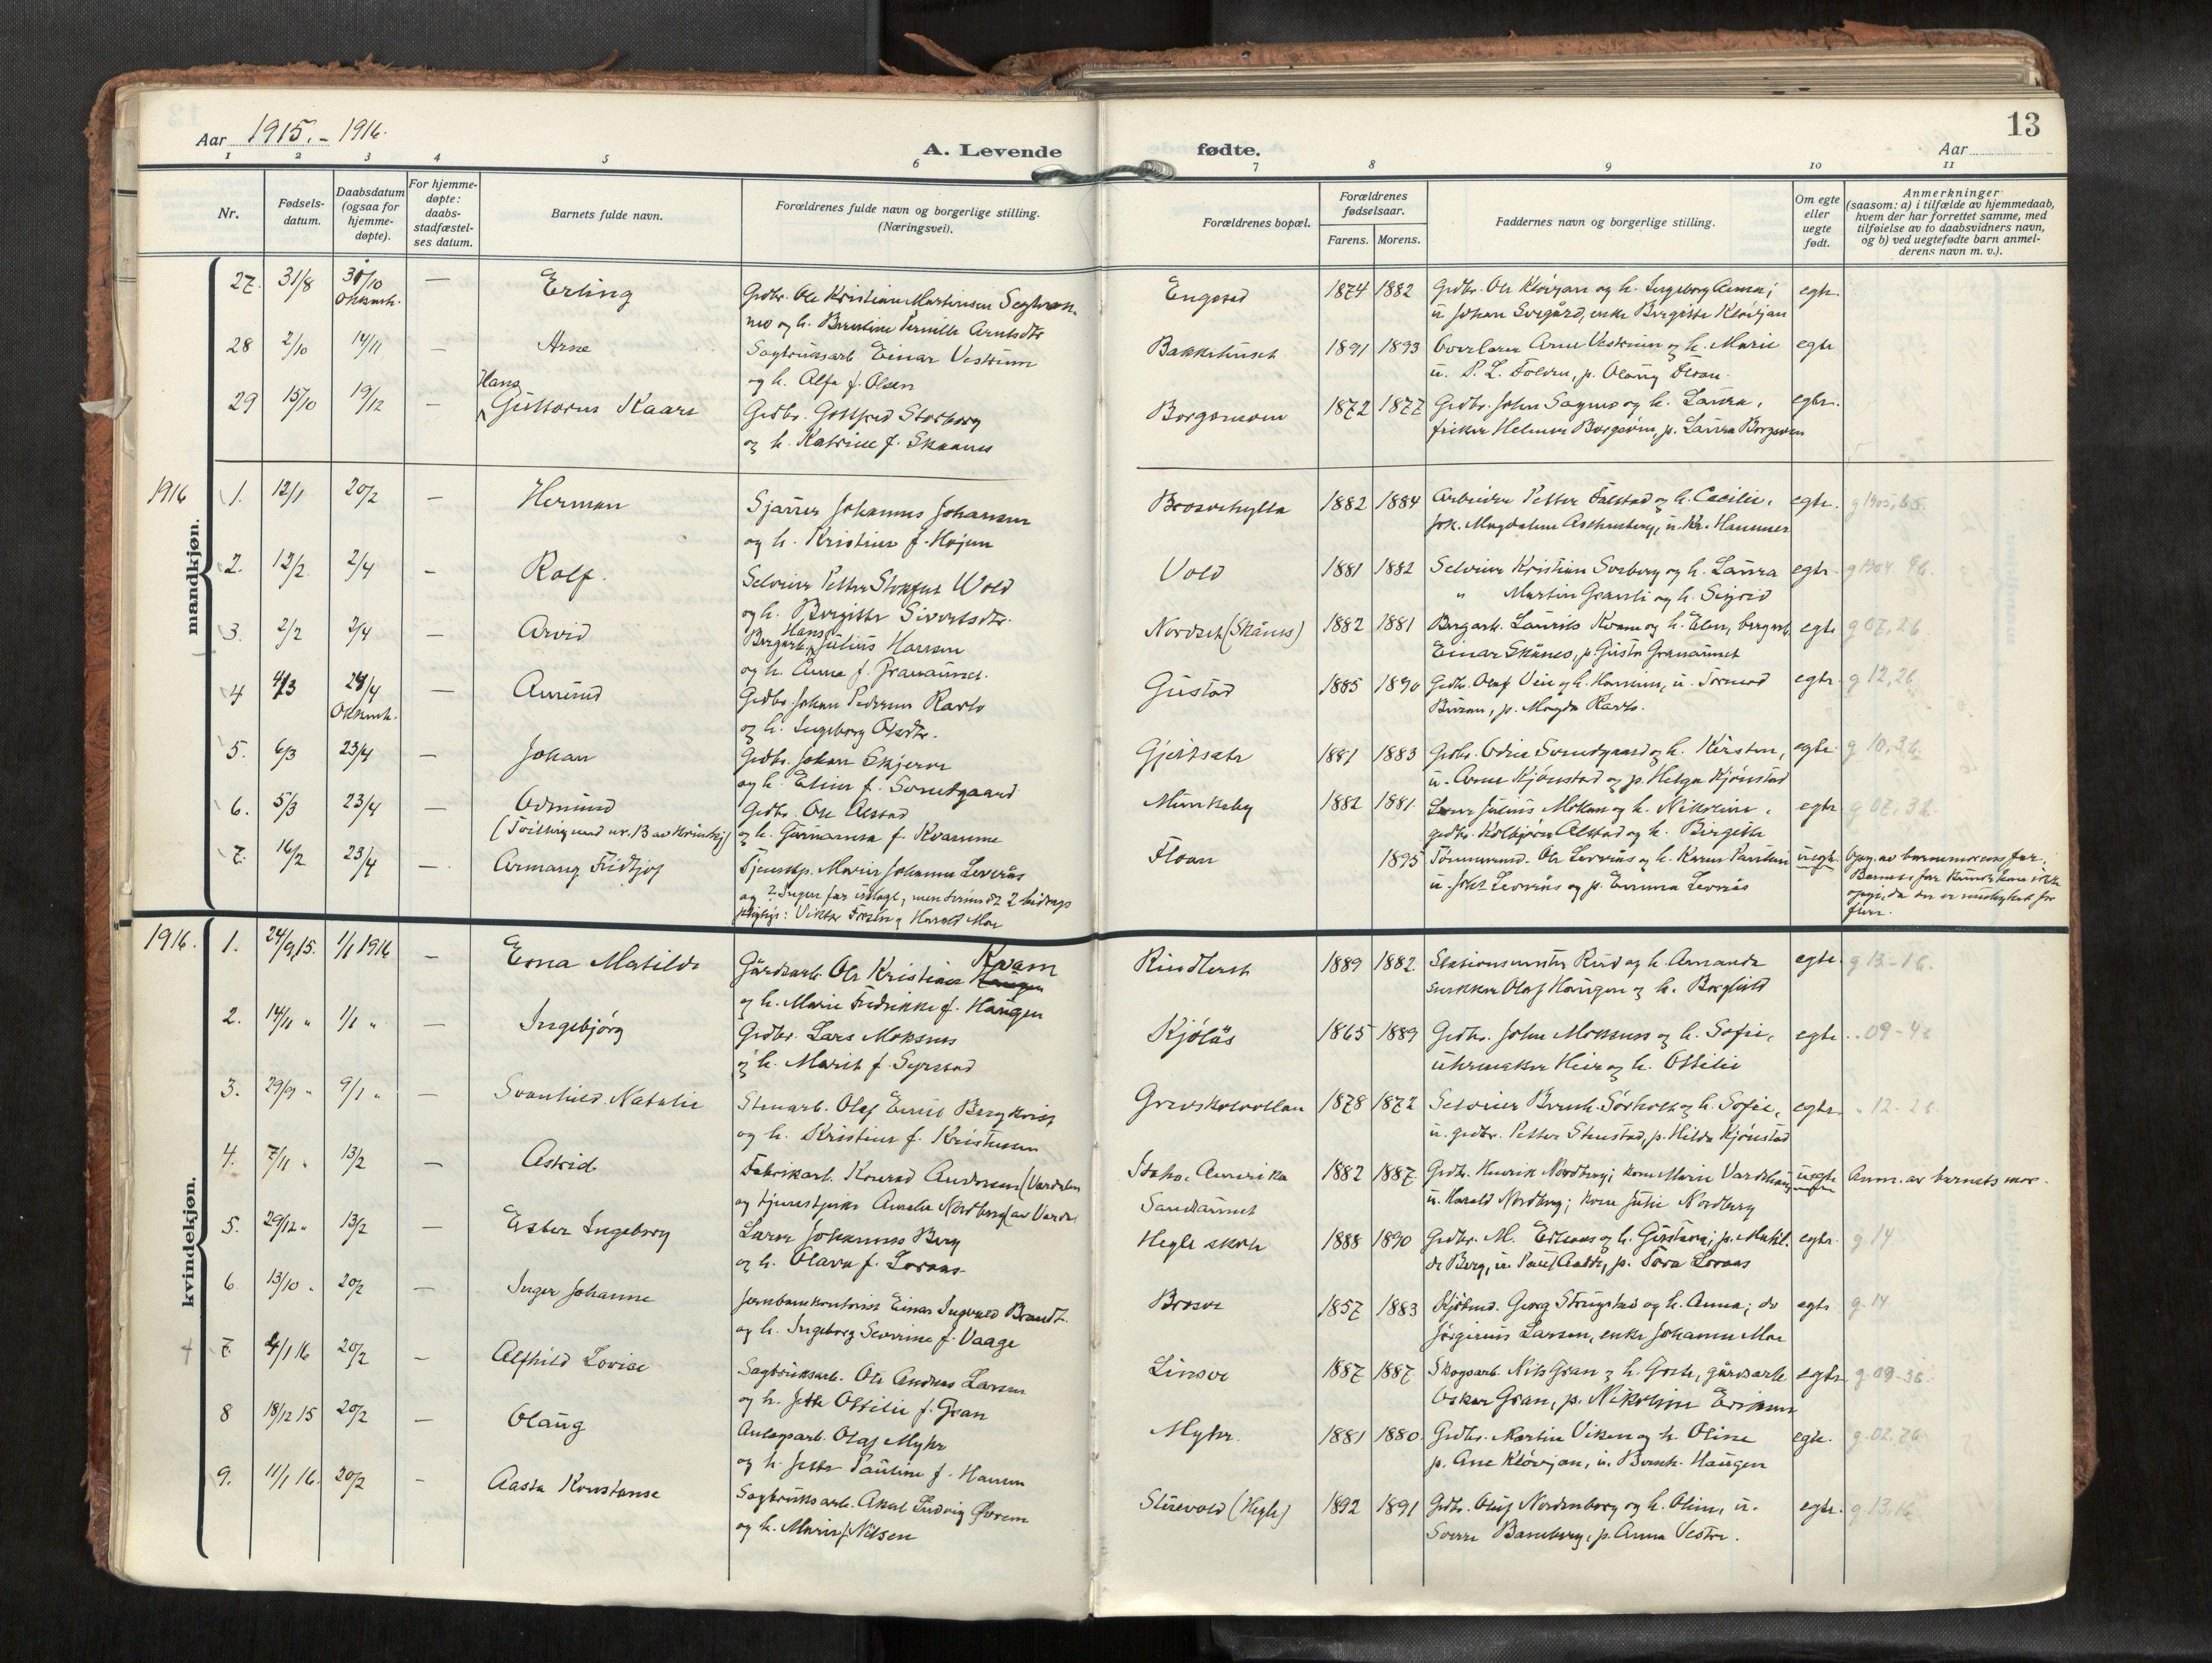 SAT, Levanger sokneprestkontor*, Parish register (official) no. 1, 1912-1935, p. 13